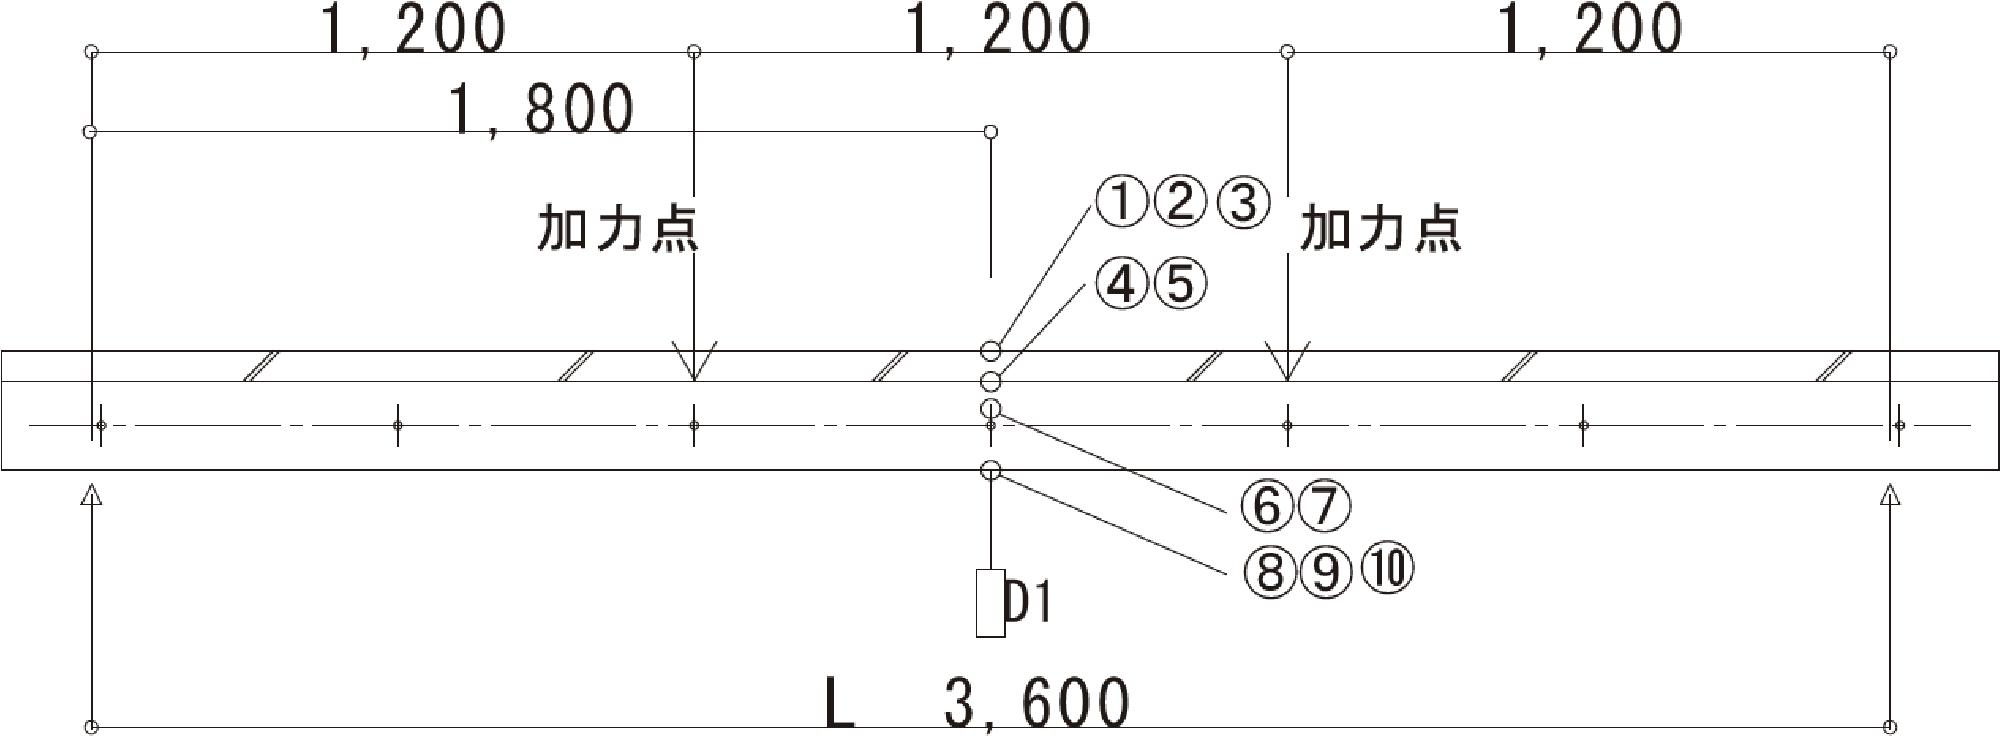 DLT150,DLT-CC 150 試験体図